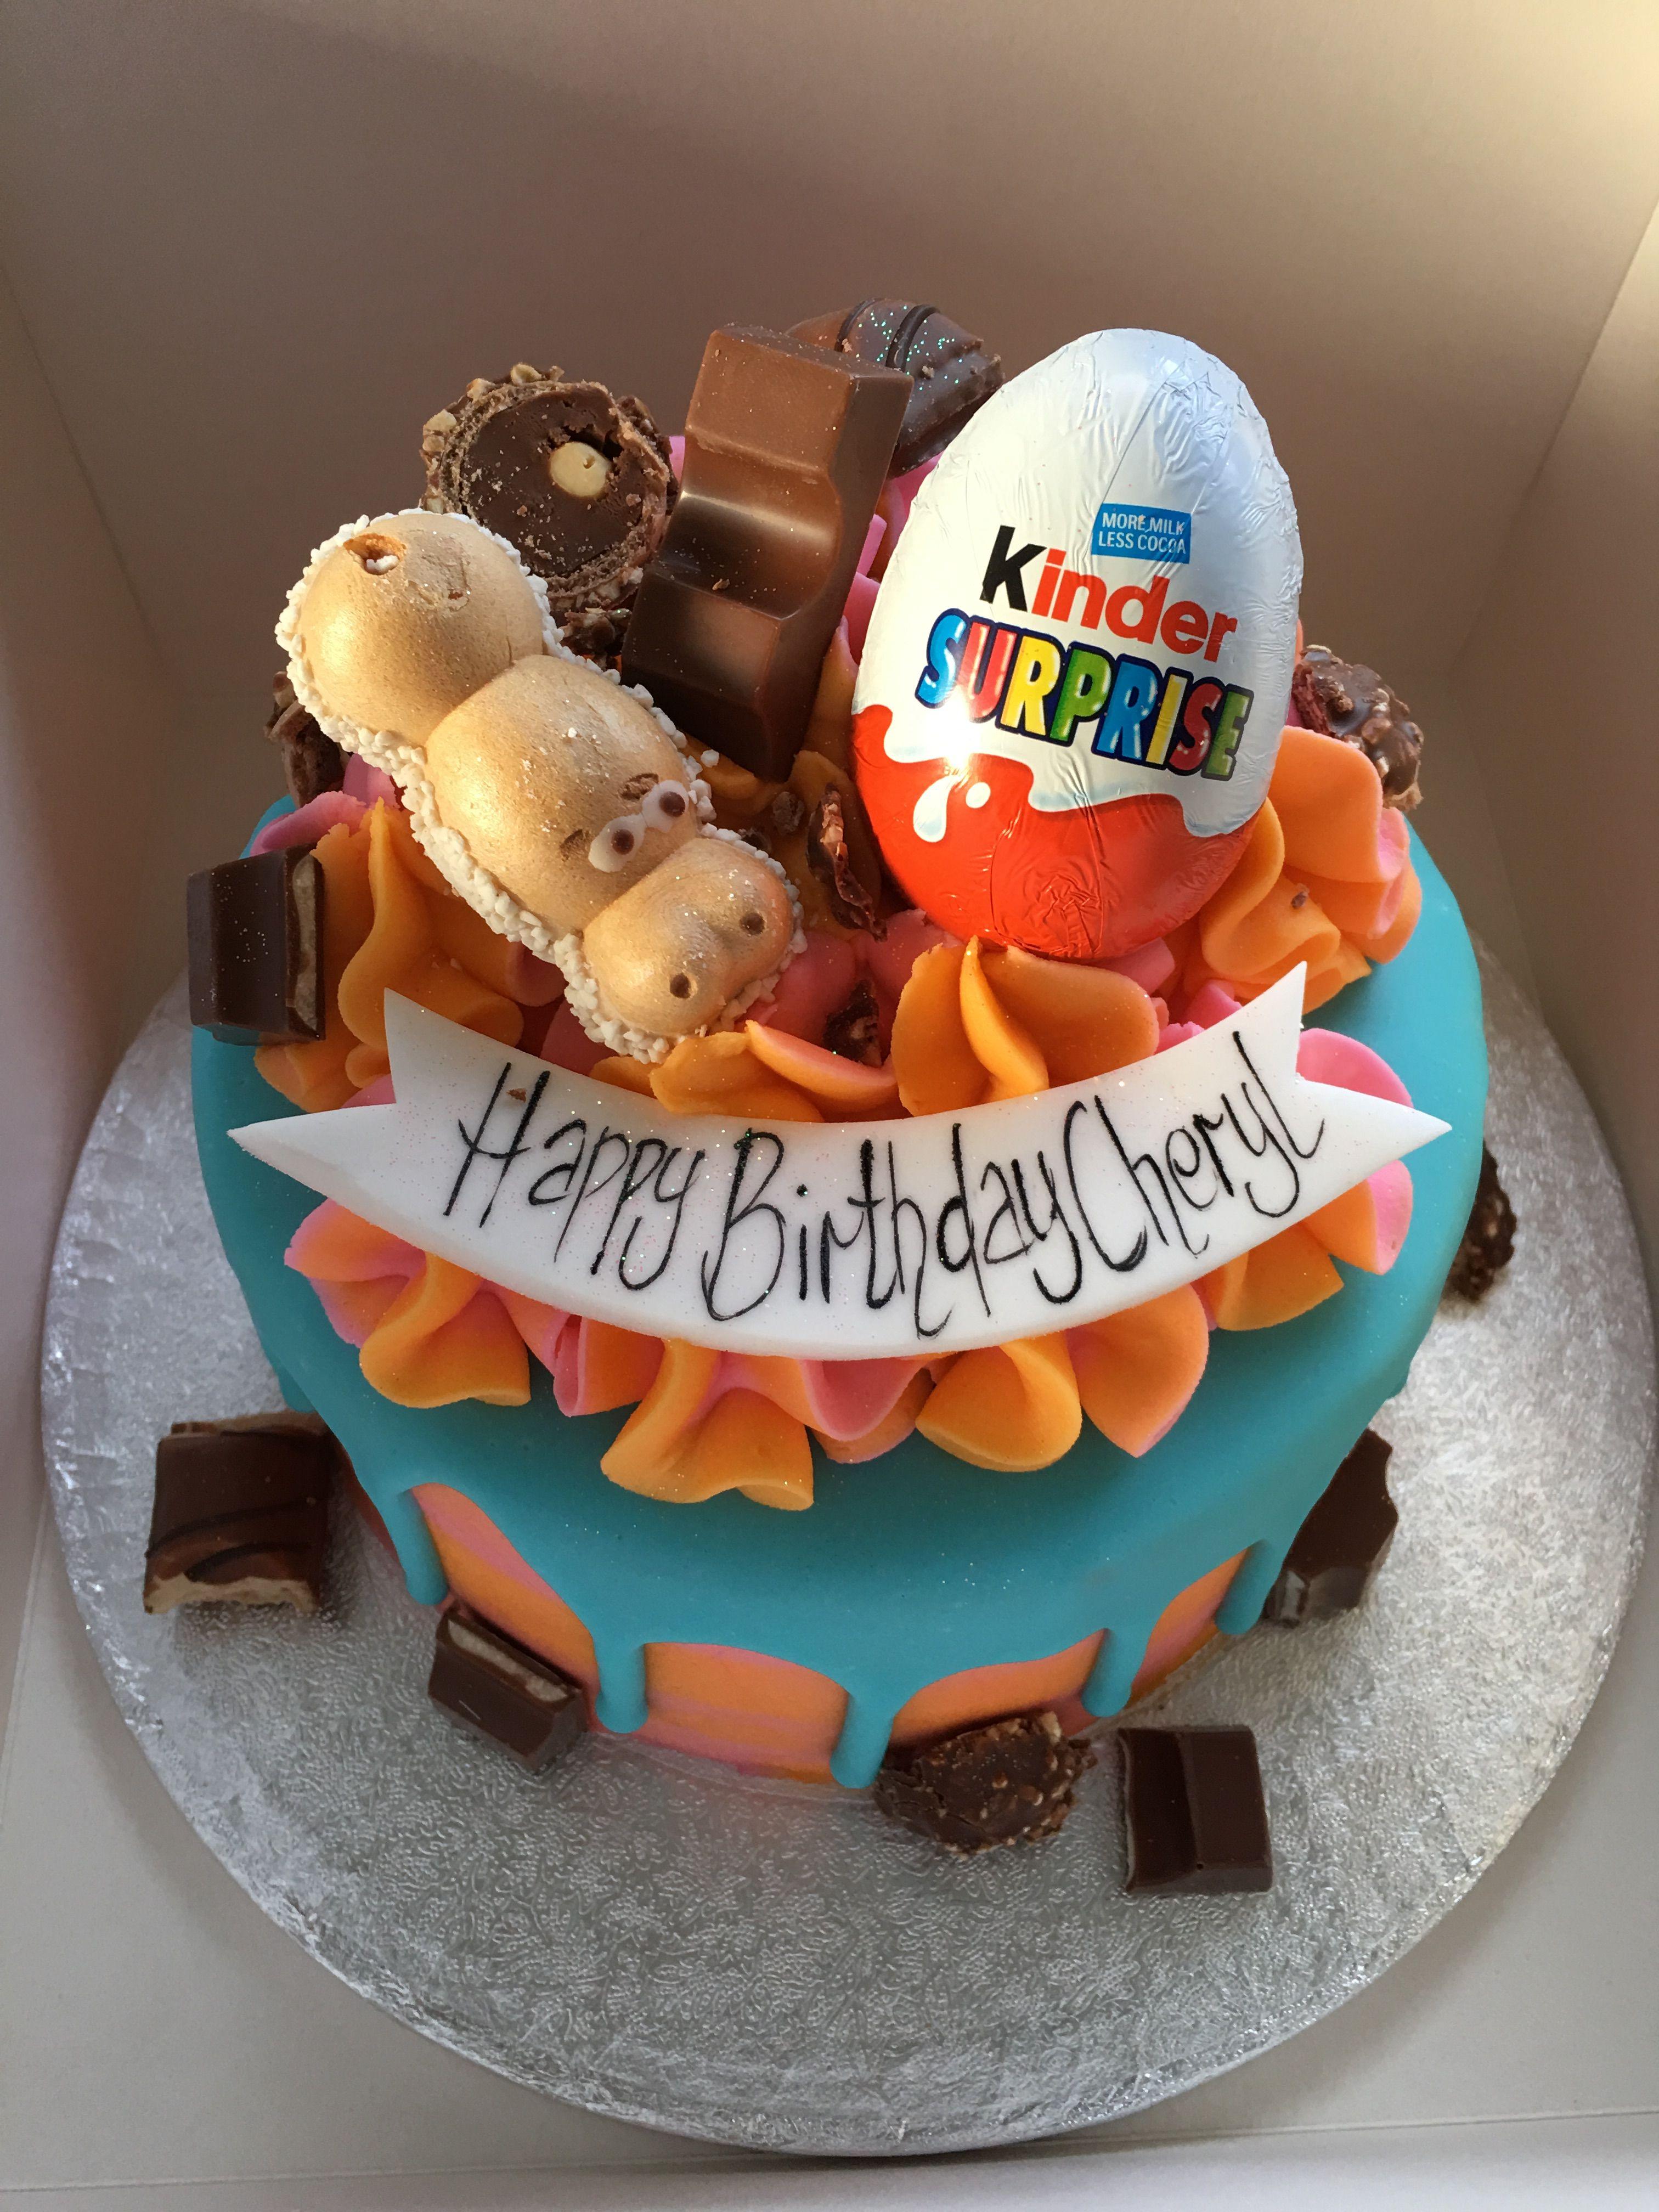 My 41st Birthday Cake With Images Birthday Cake Cake 41st